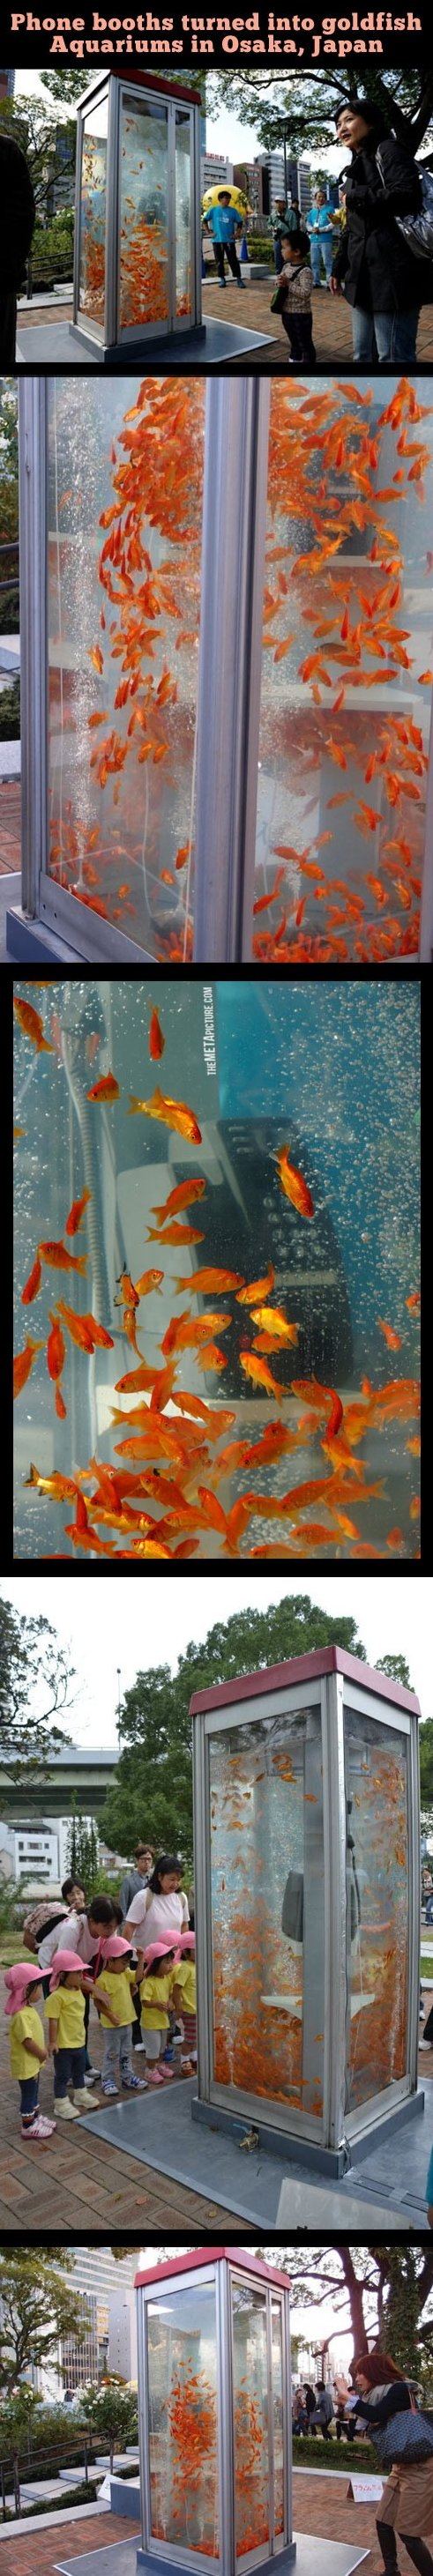 Awesome Aquarium phone booths